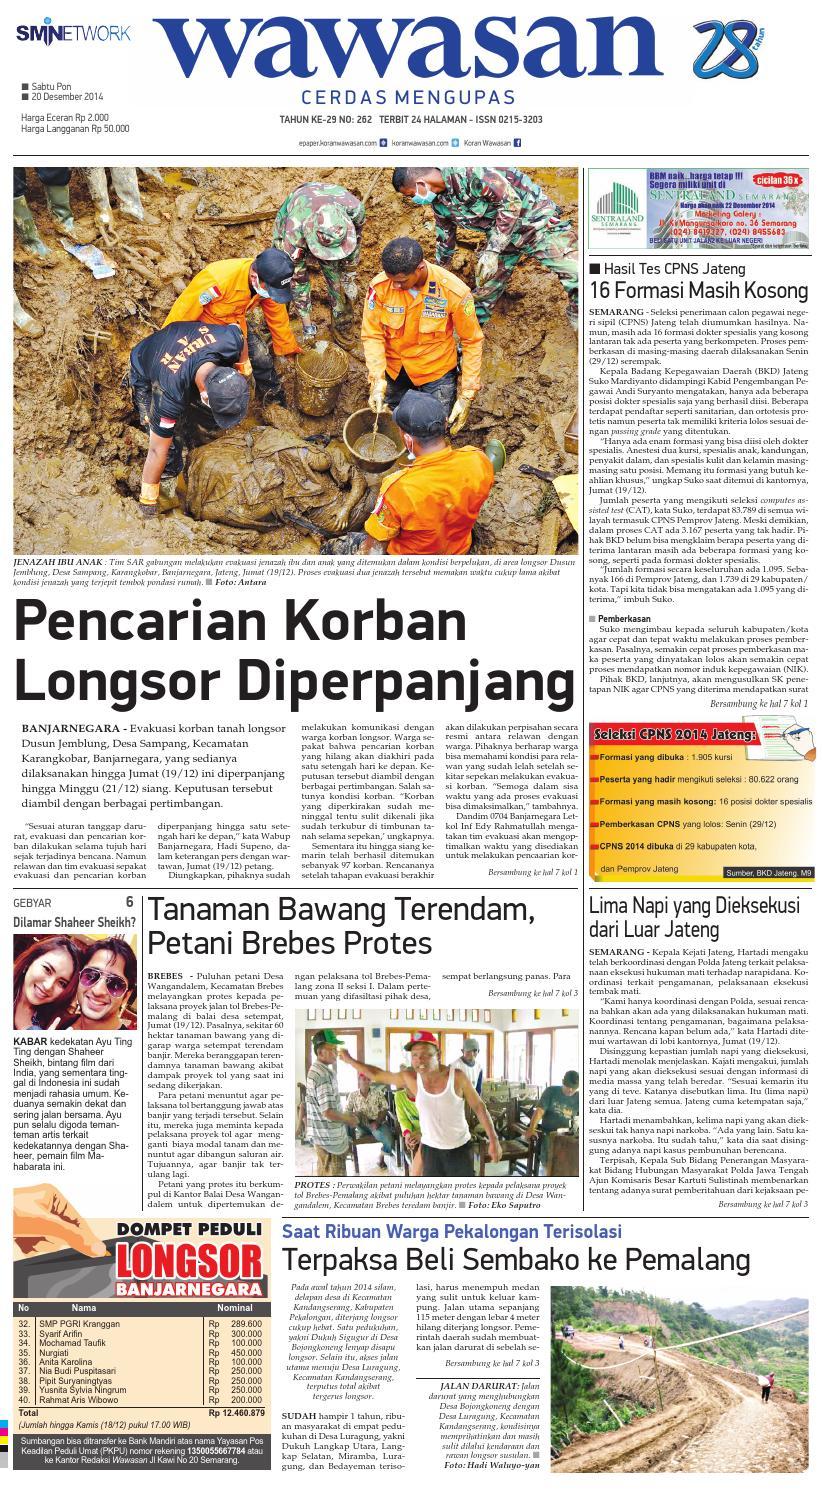 Wawasan 20 Desember 2014 By Koran Pagi Issuu Produk Ukm Bumn Ring Mutiara Mas Putih Laut